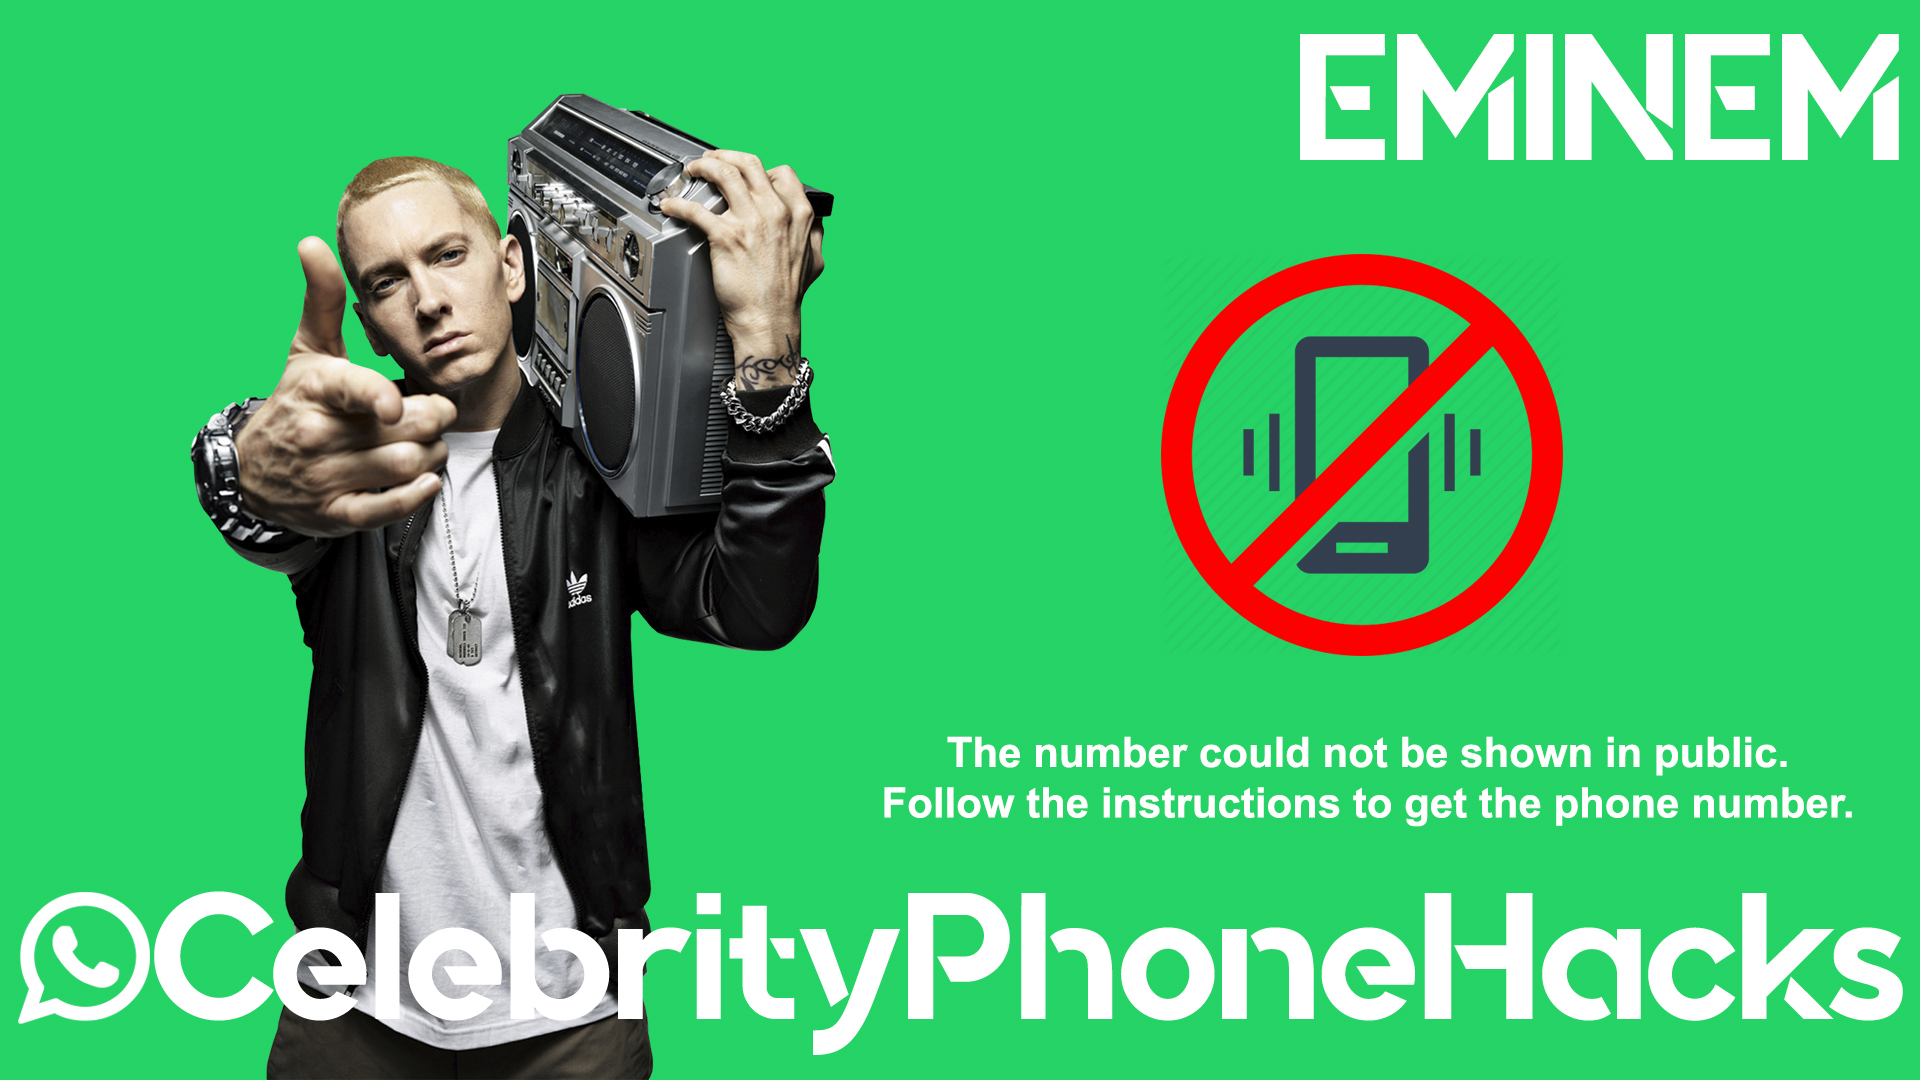 Eminem real phone number 2019 whatsapp hacked leaked